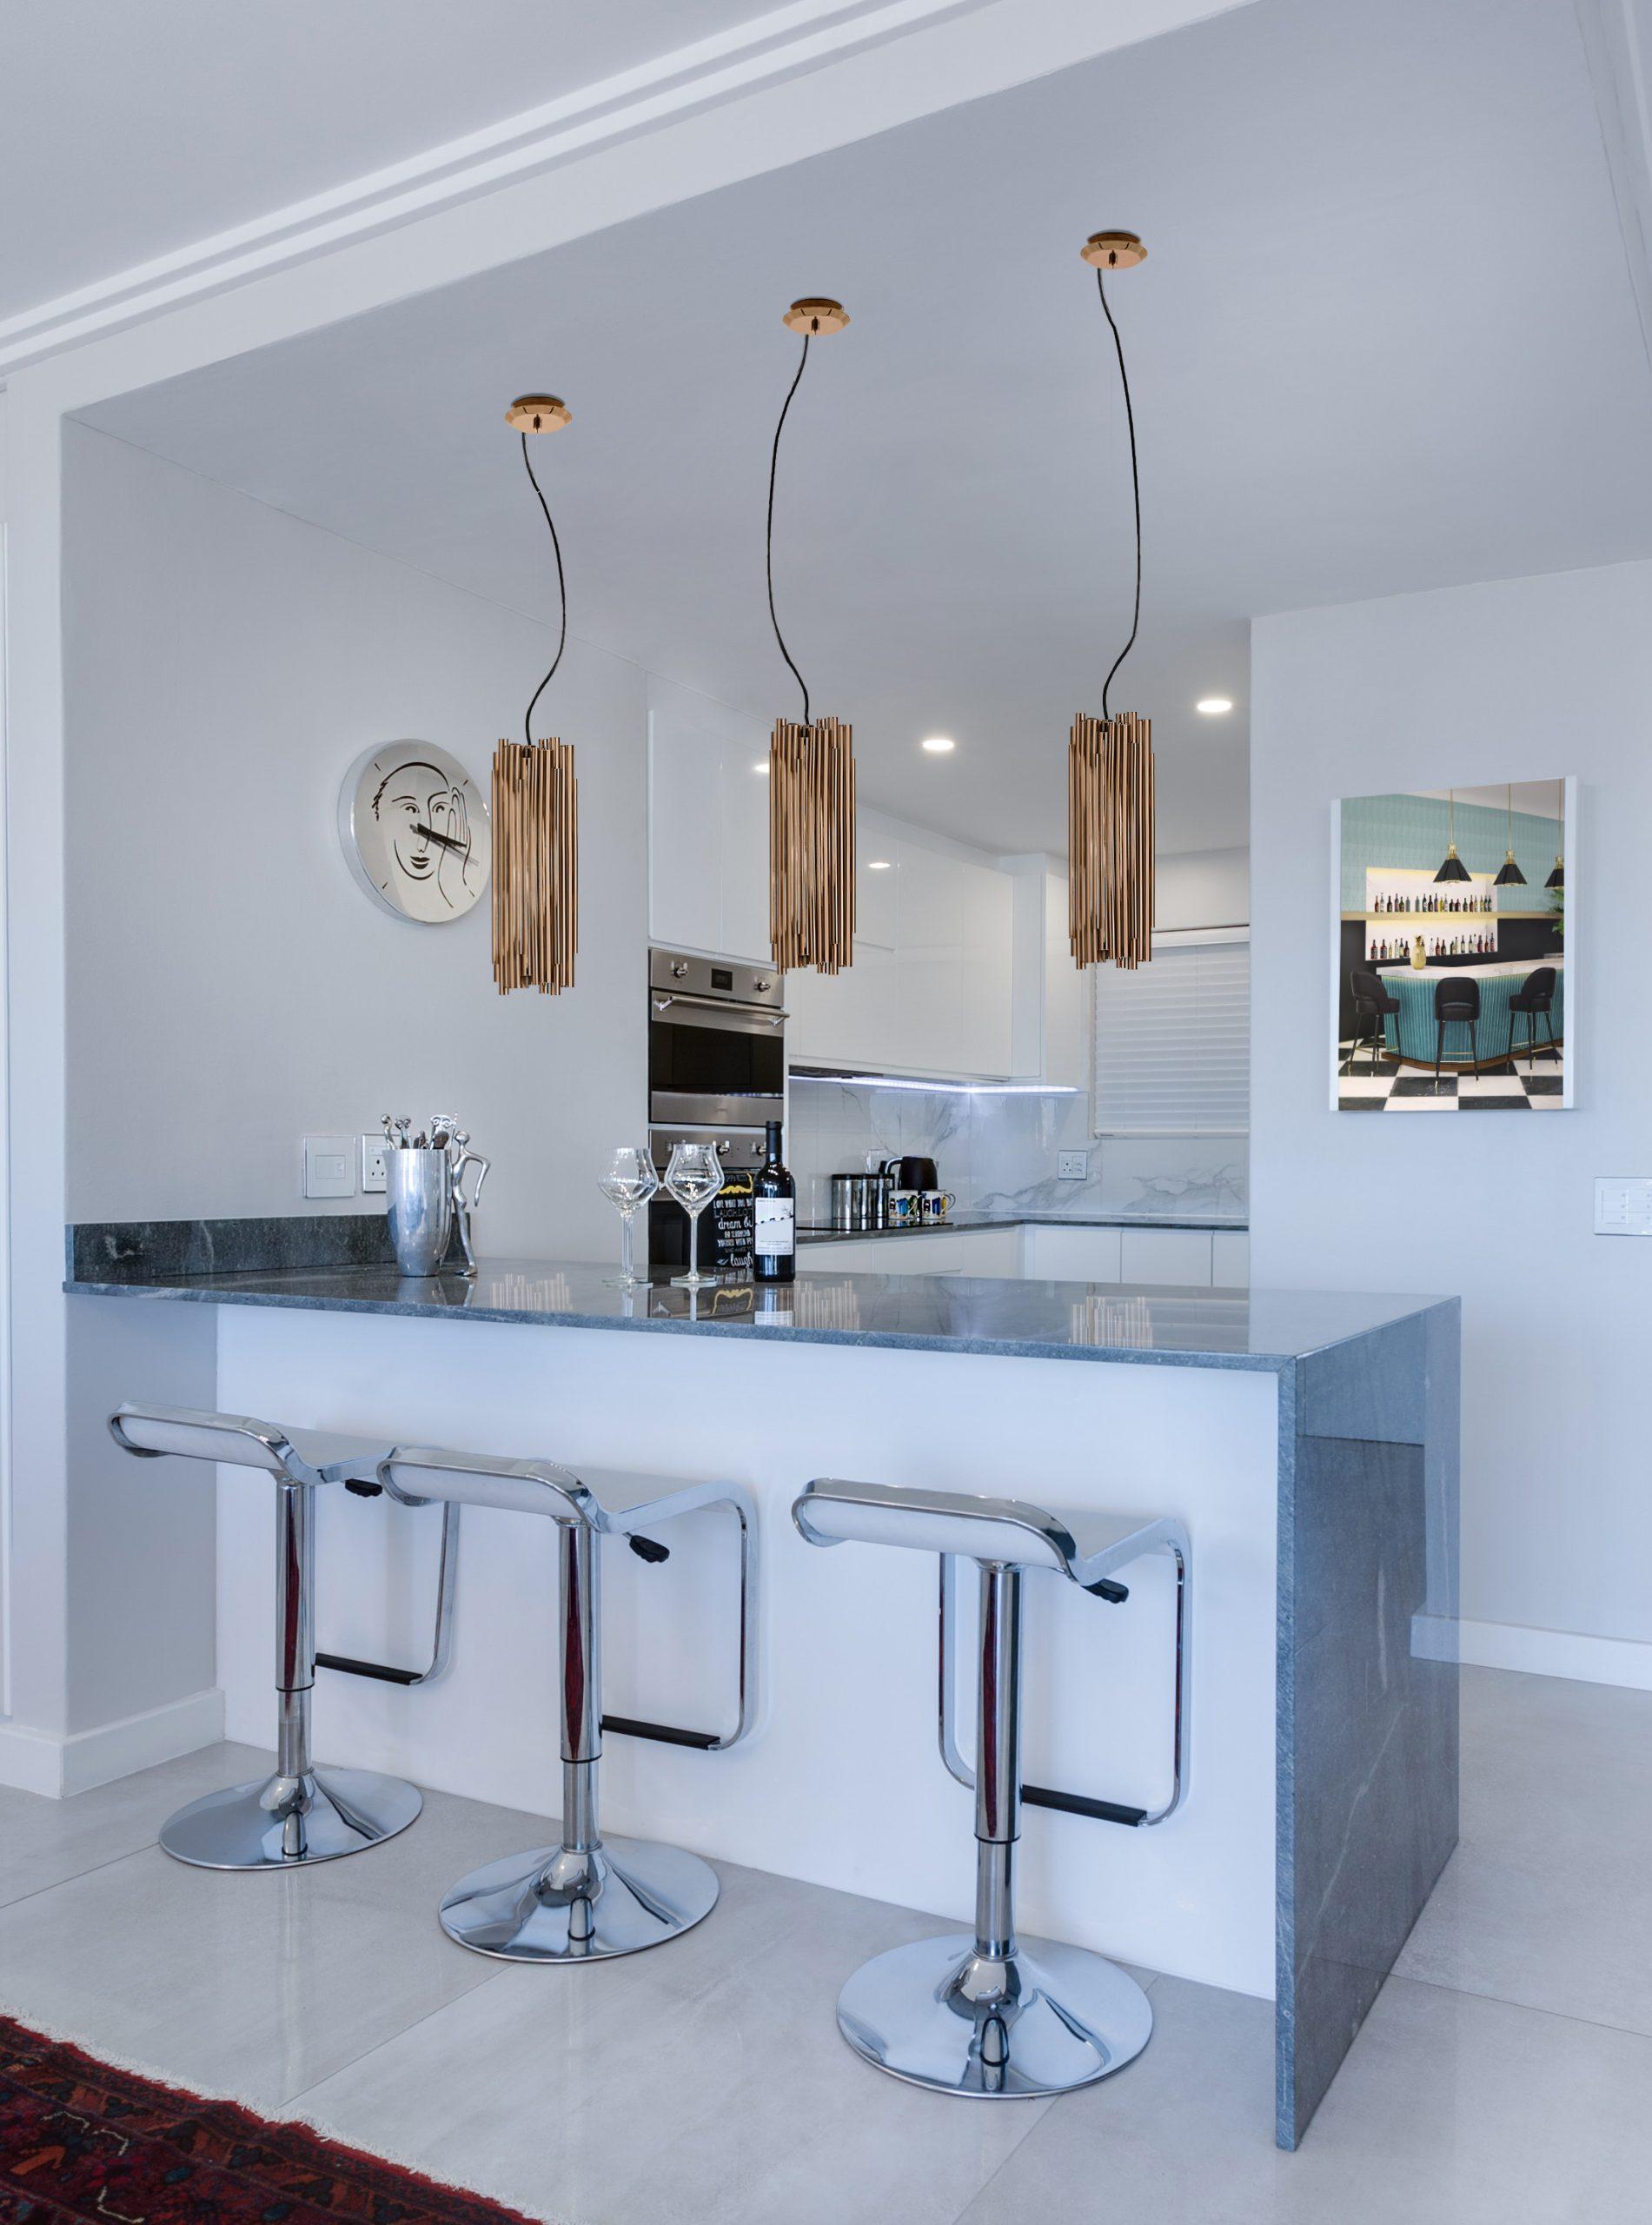 5 Amazing Kitchen Island Ideas 🍳 CHECK OUT! kitchen island 5 Amazing Kitchen Island Ideas 🍳 CHECK OUT! 1 18 scaled